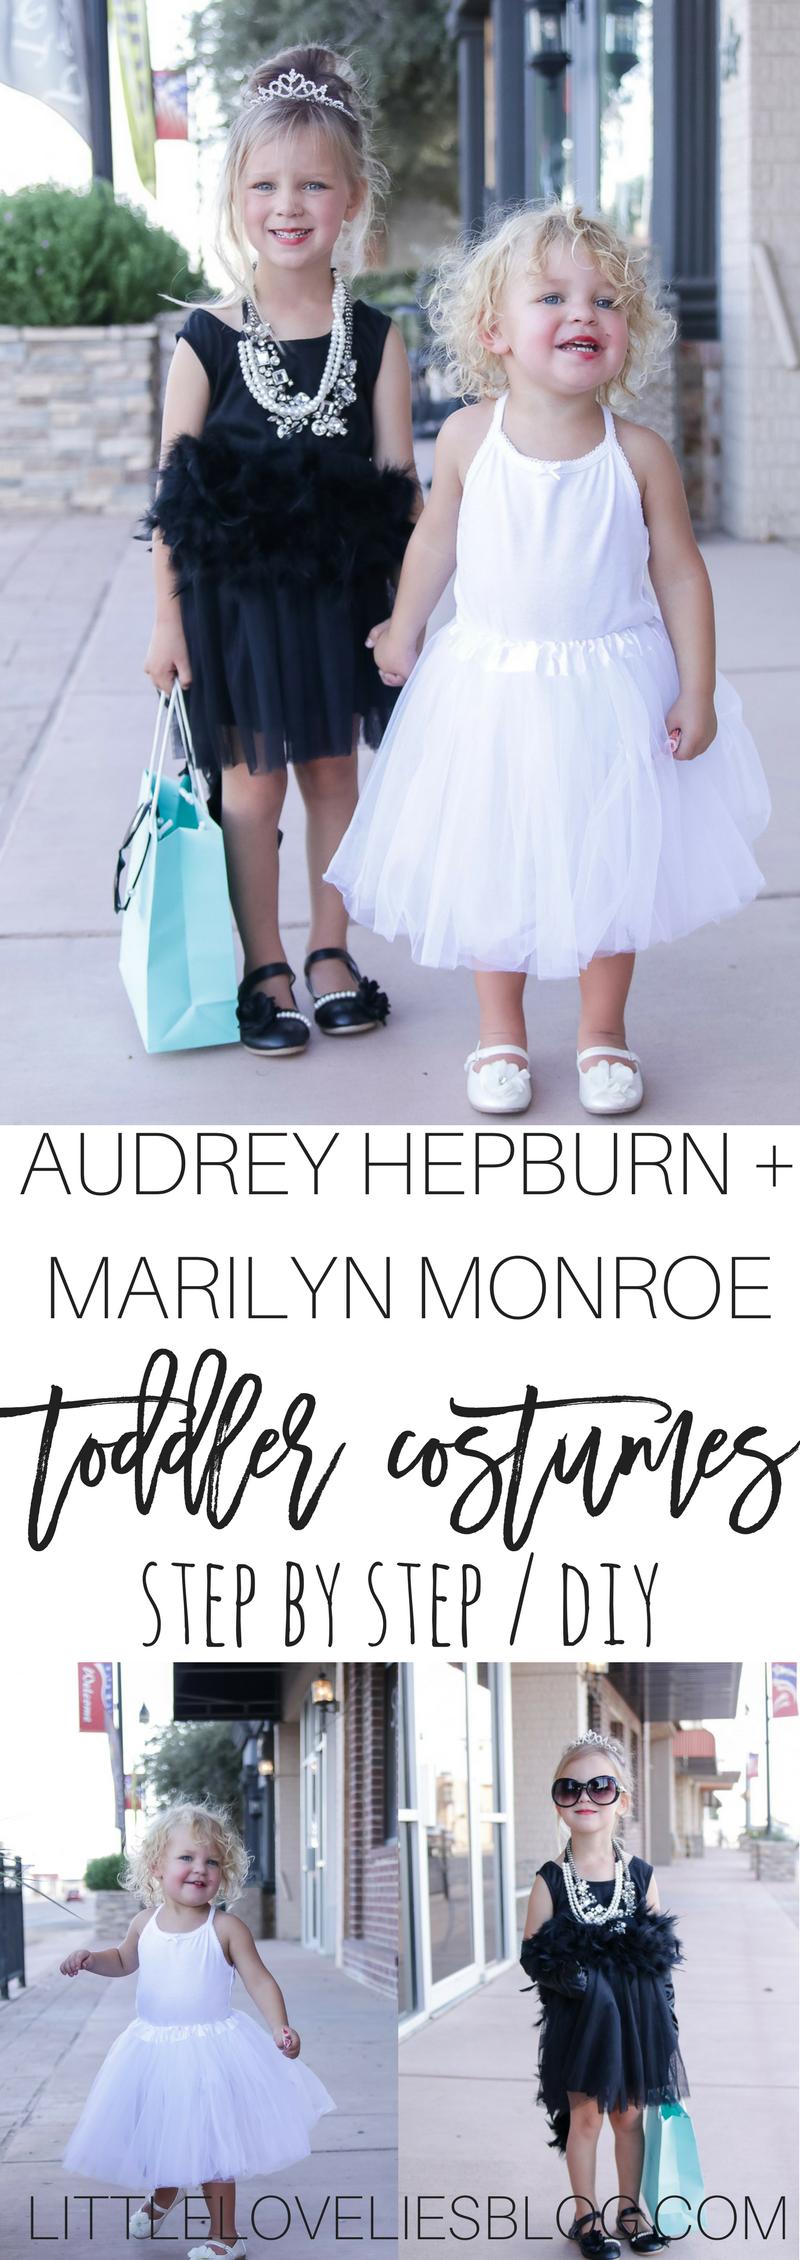 DIY Toddler Audrey Hepburn Breakfast at Tiffany's Costume Marilyn Monroe Sister Costume (1)